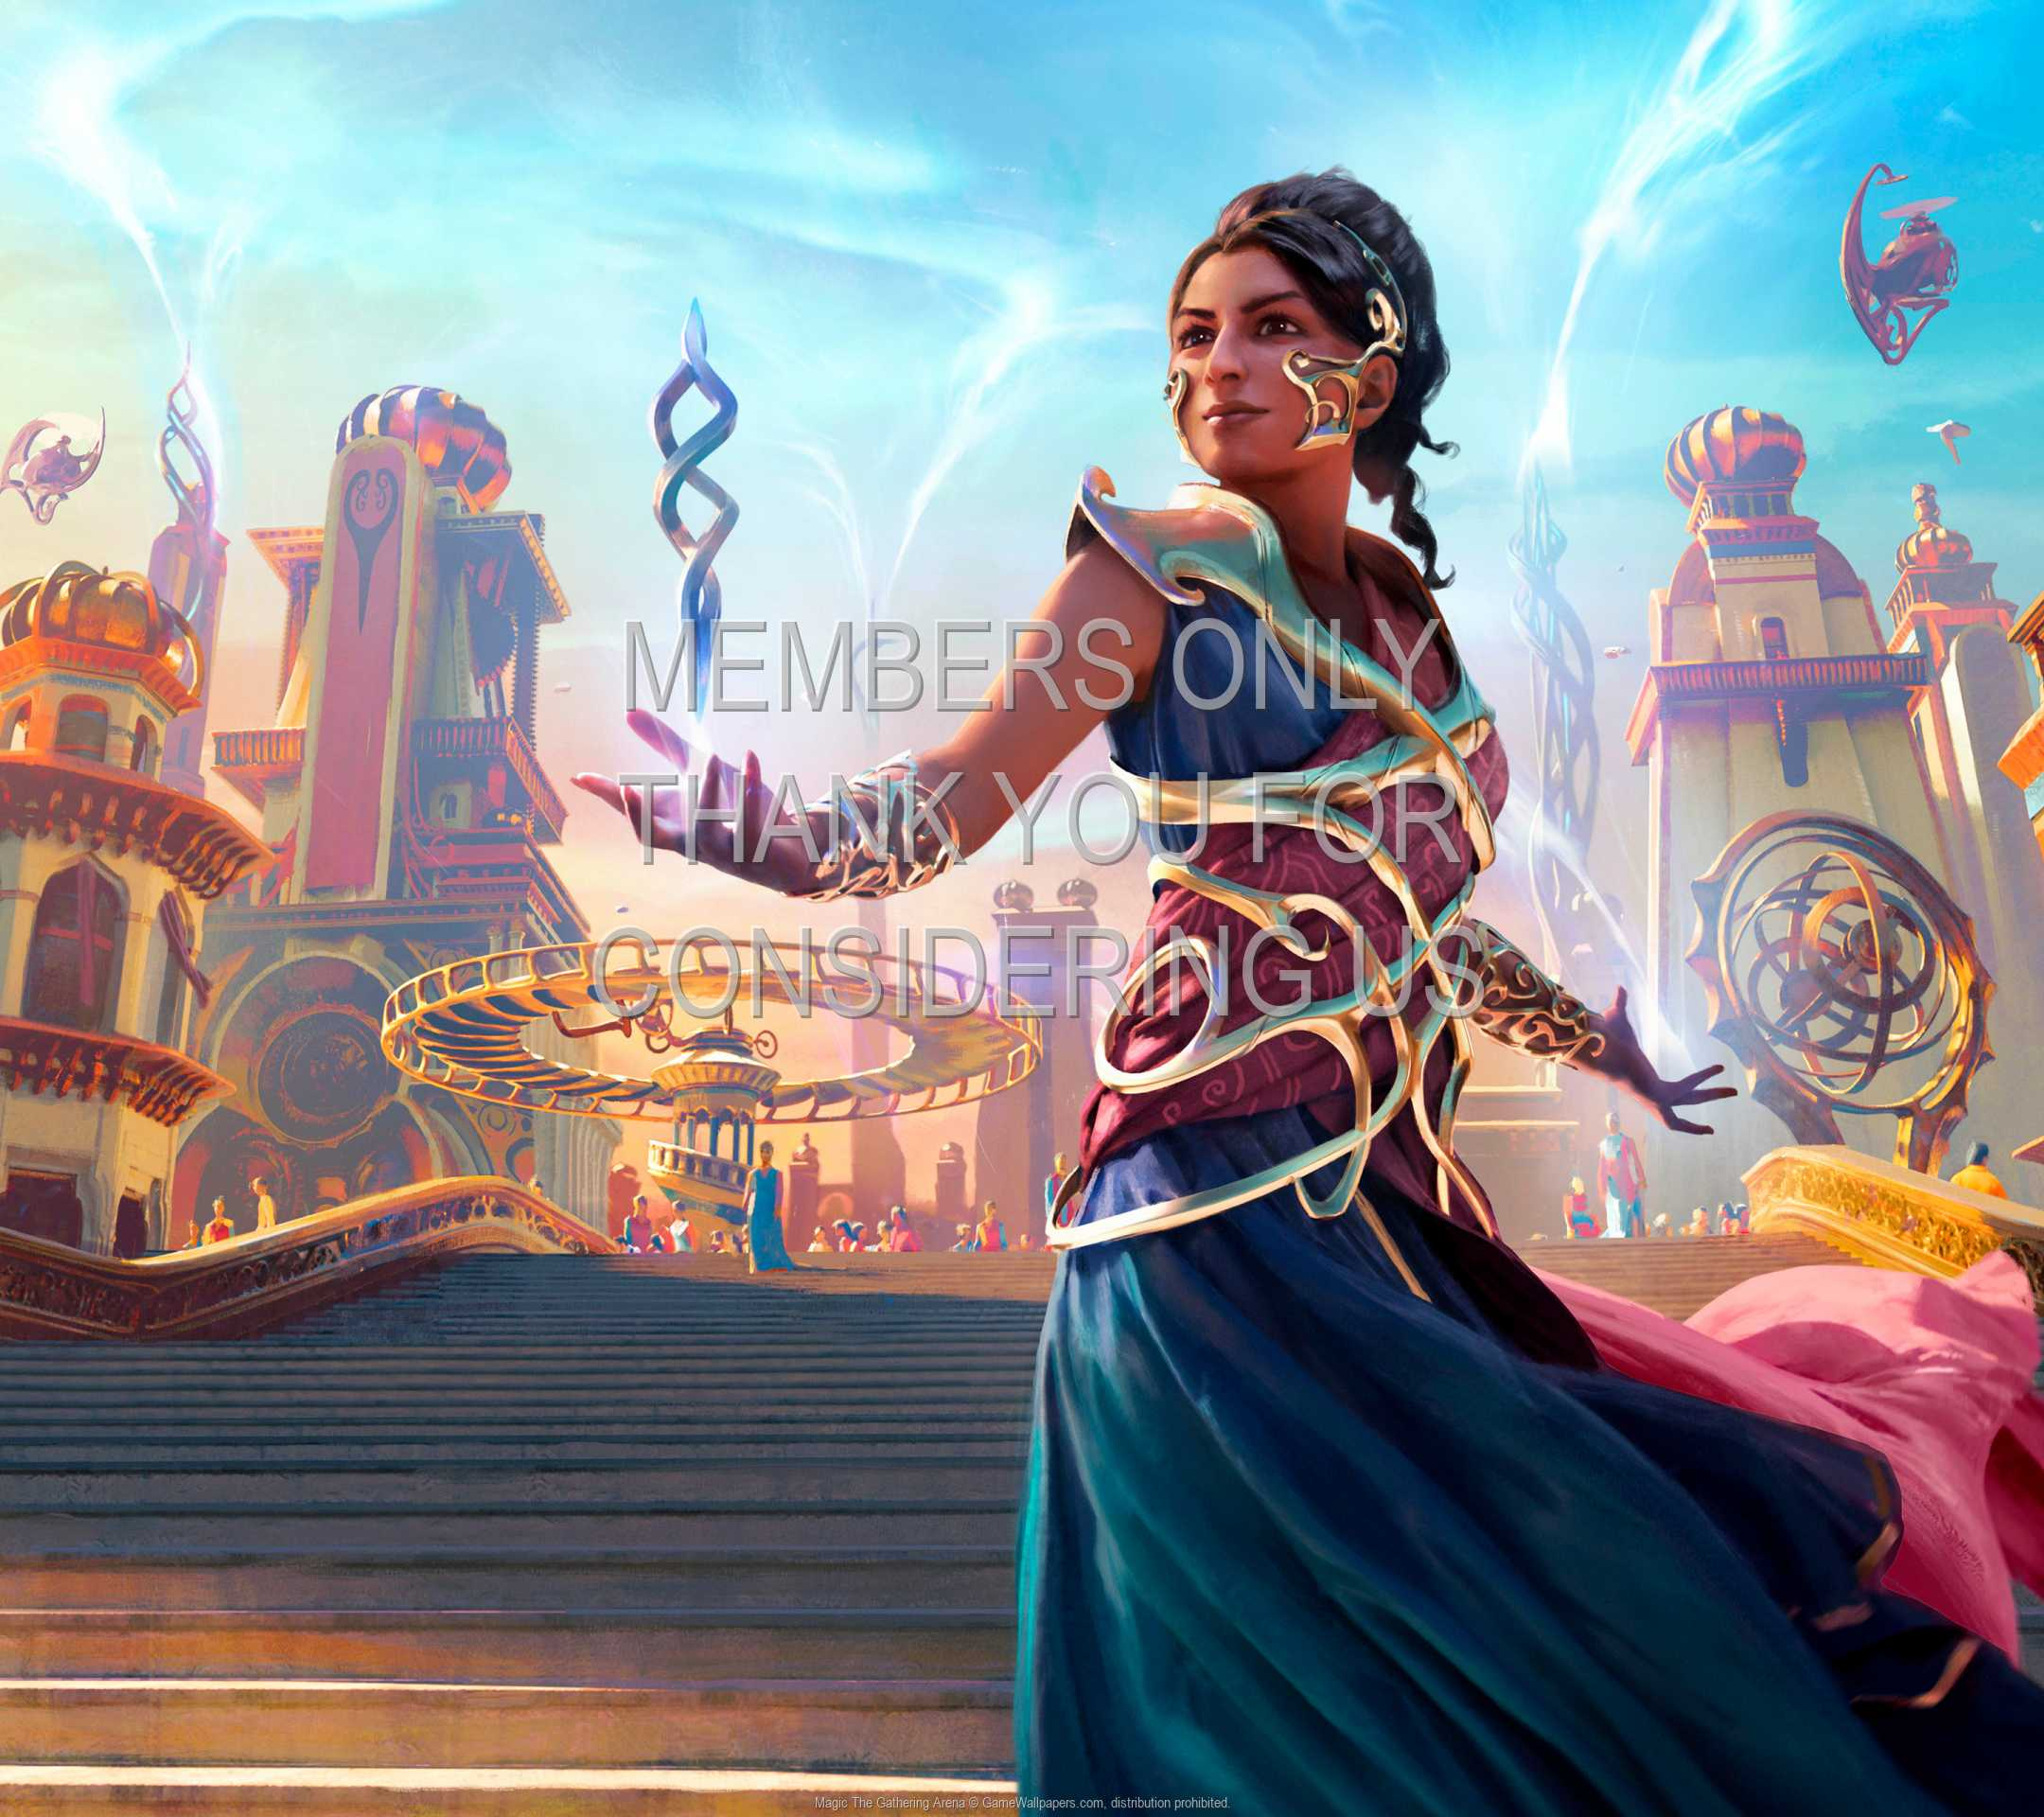 Magic: The Gathering Arena 1080p Horizontal Mobile wallpaper or background 06